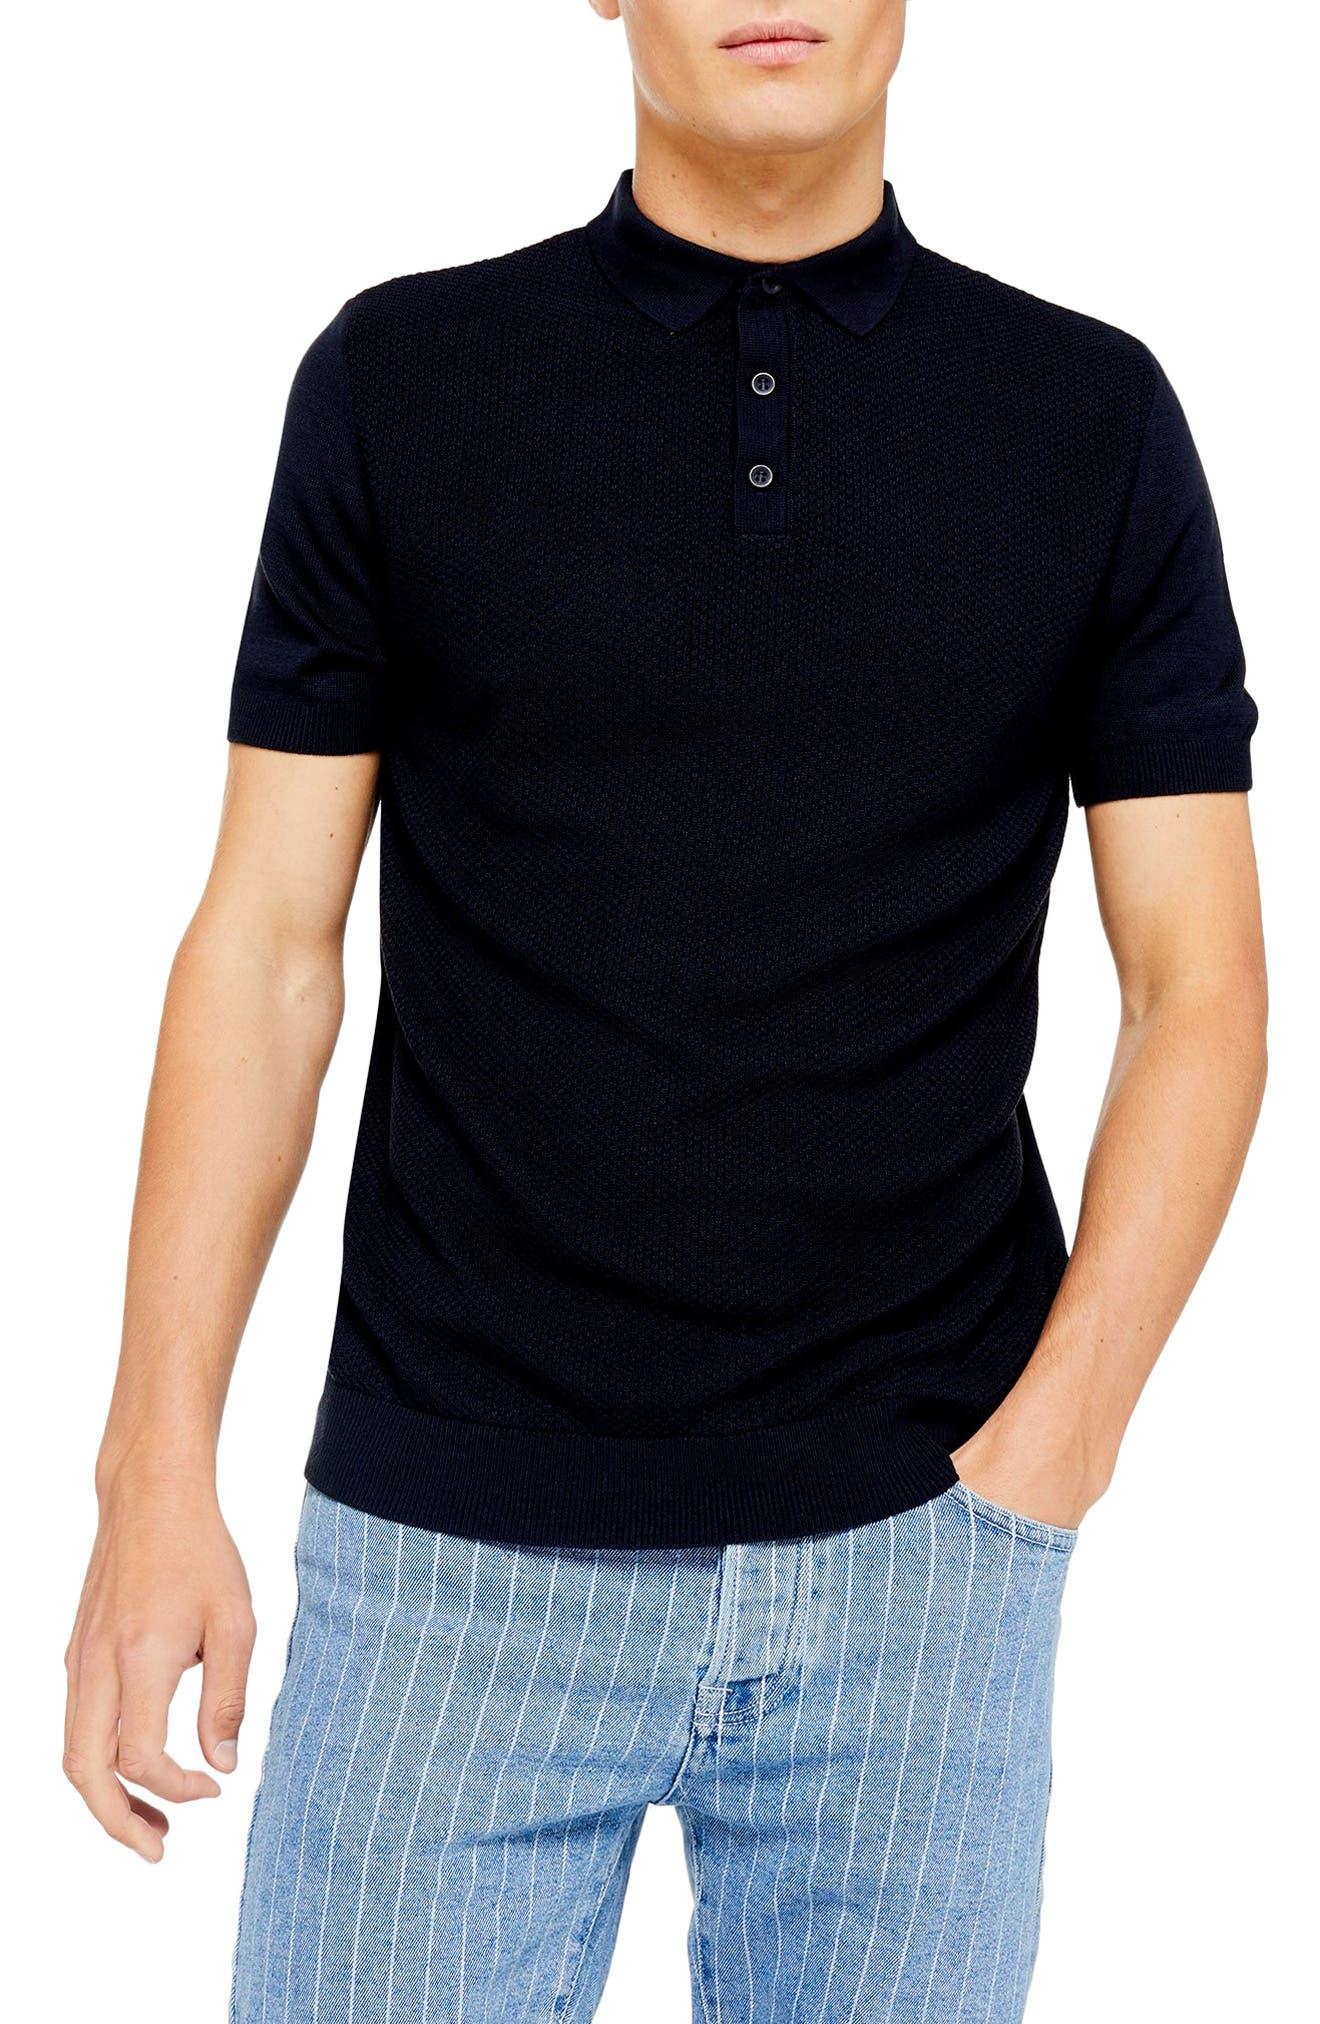 1930s Mens Shirts | Dress Shirts, Polo Shirts, Work Shirts Mens Topman Classic Sweater Polo Shirt Size XX-Large - Blue $45.00 AT vintagedancer.com